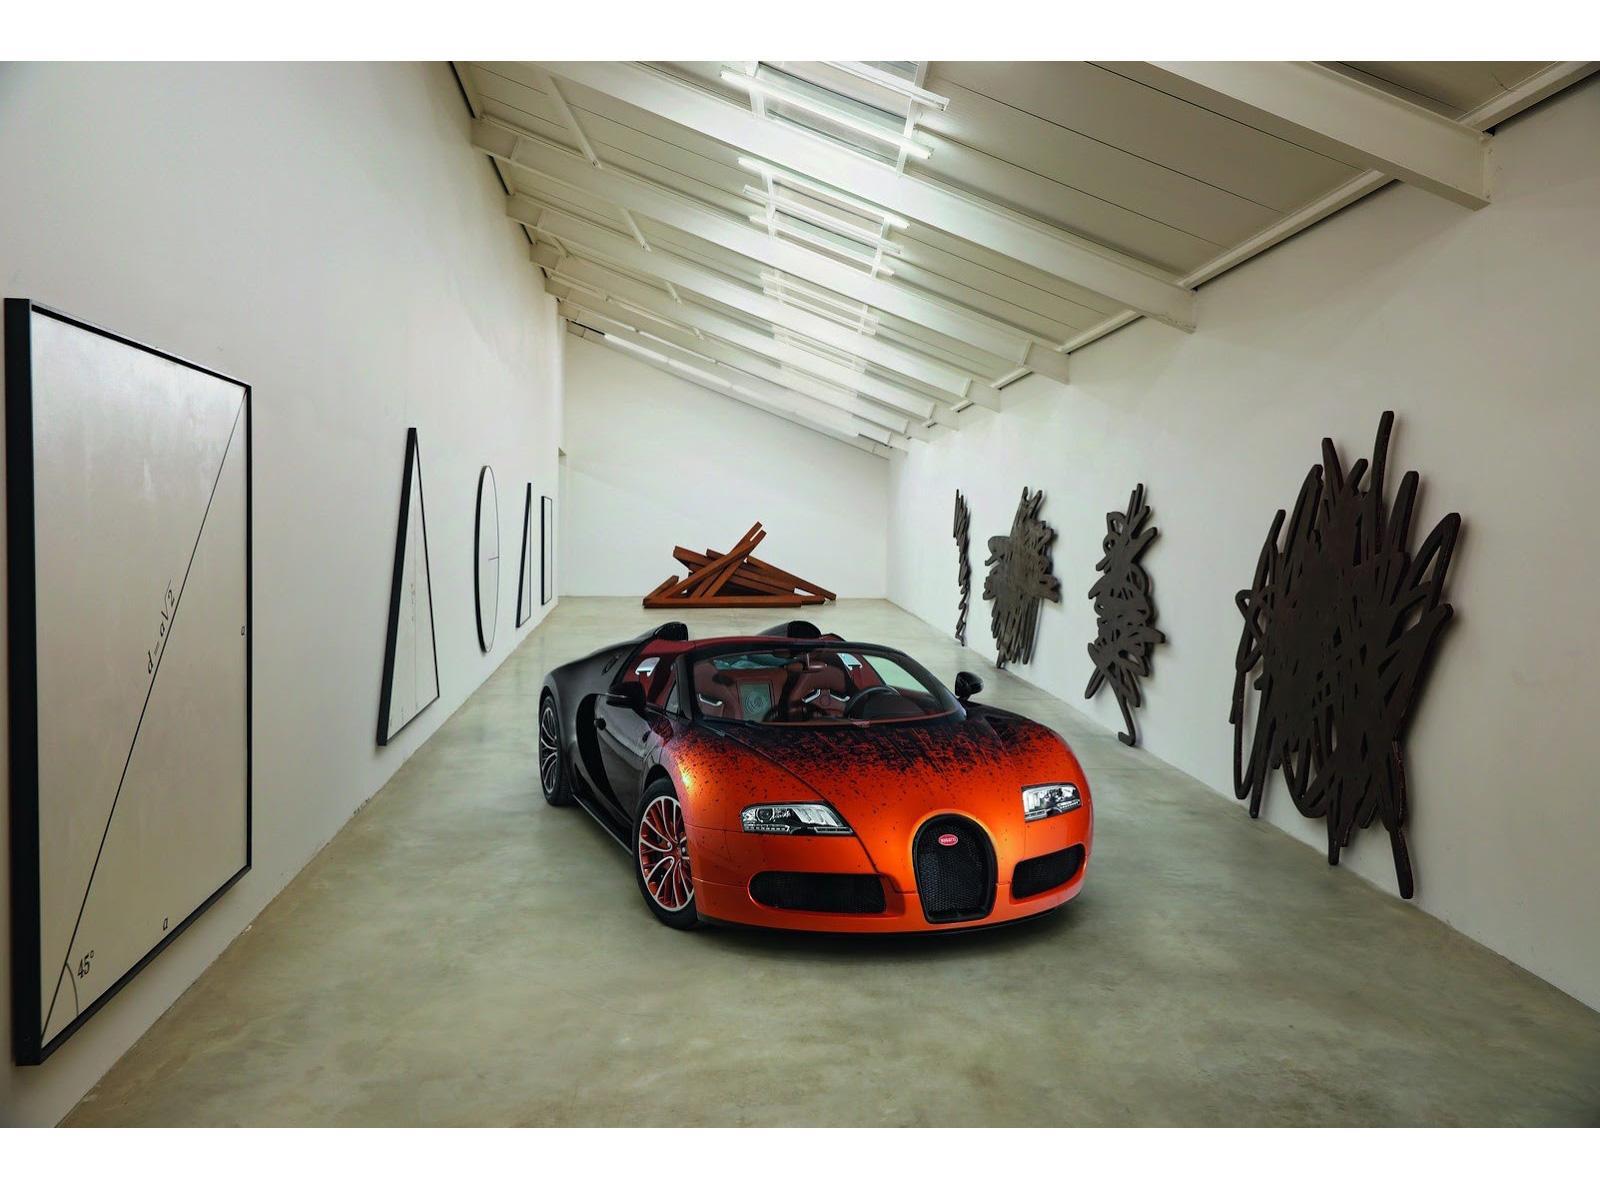 GAZ_0e3f832a267b47e6a1803cfd37a7e8bb Outstanding Bugatti Veyron Grand Sport Vitesse 'le Ciel Californien' Cars Trend